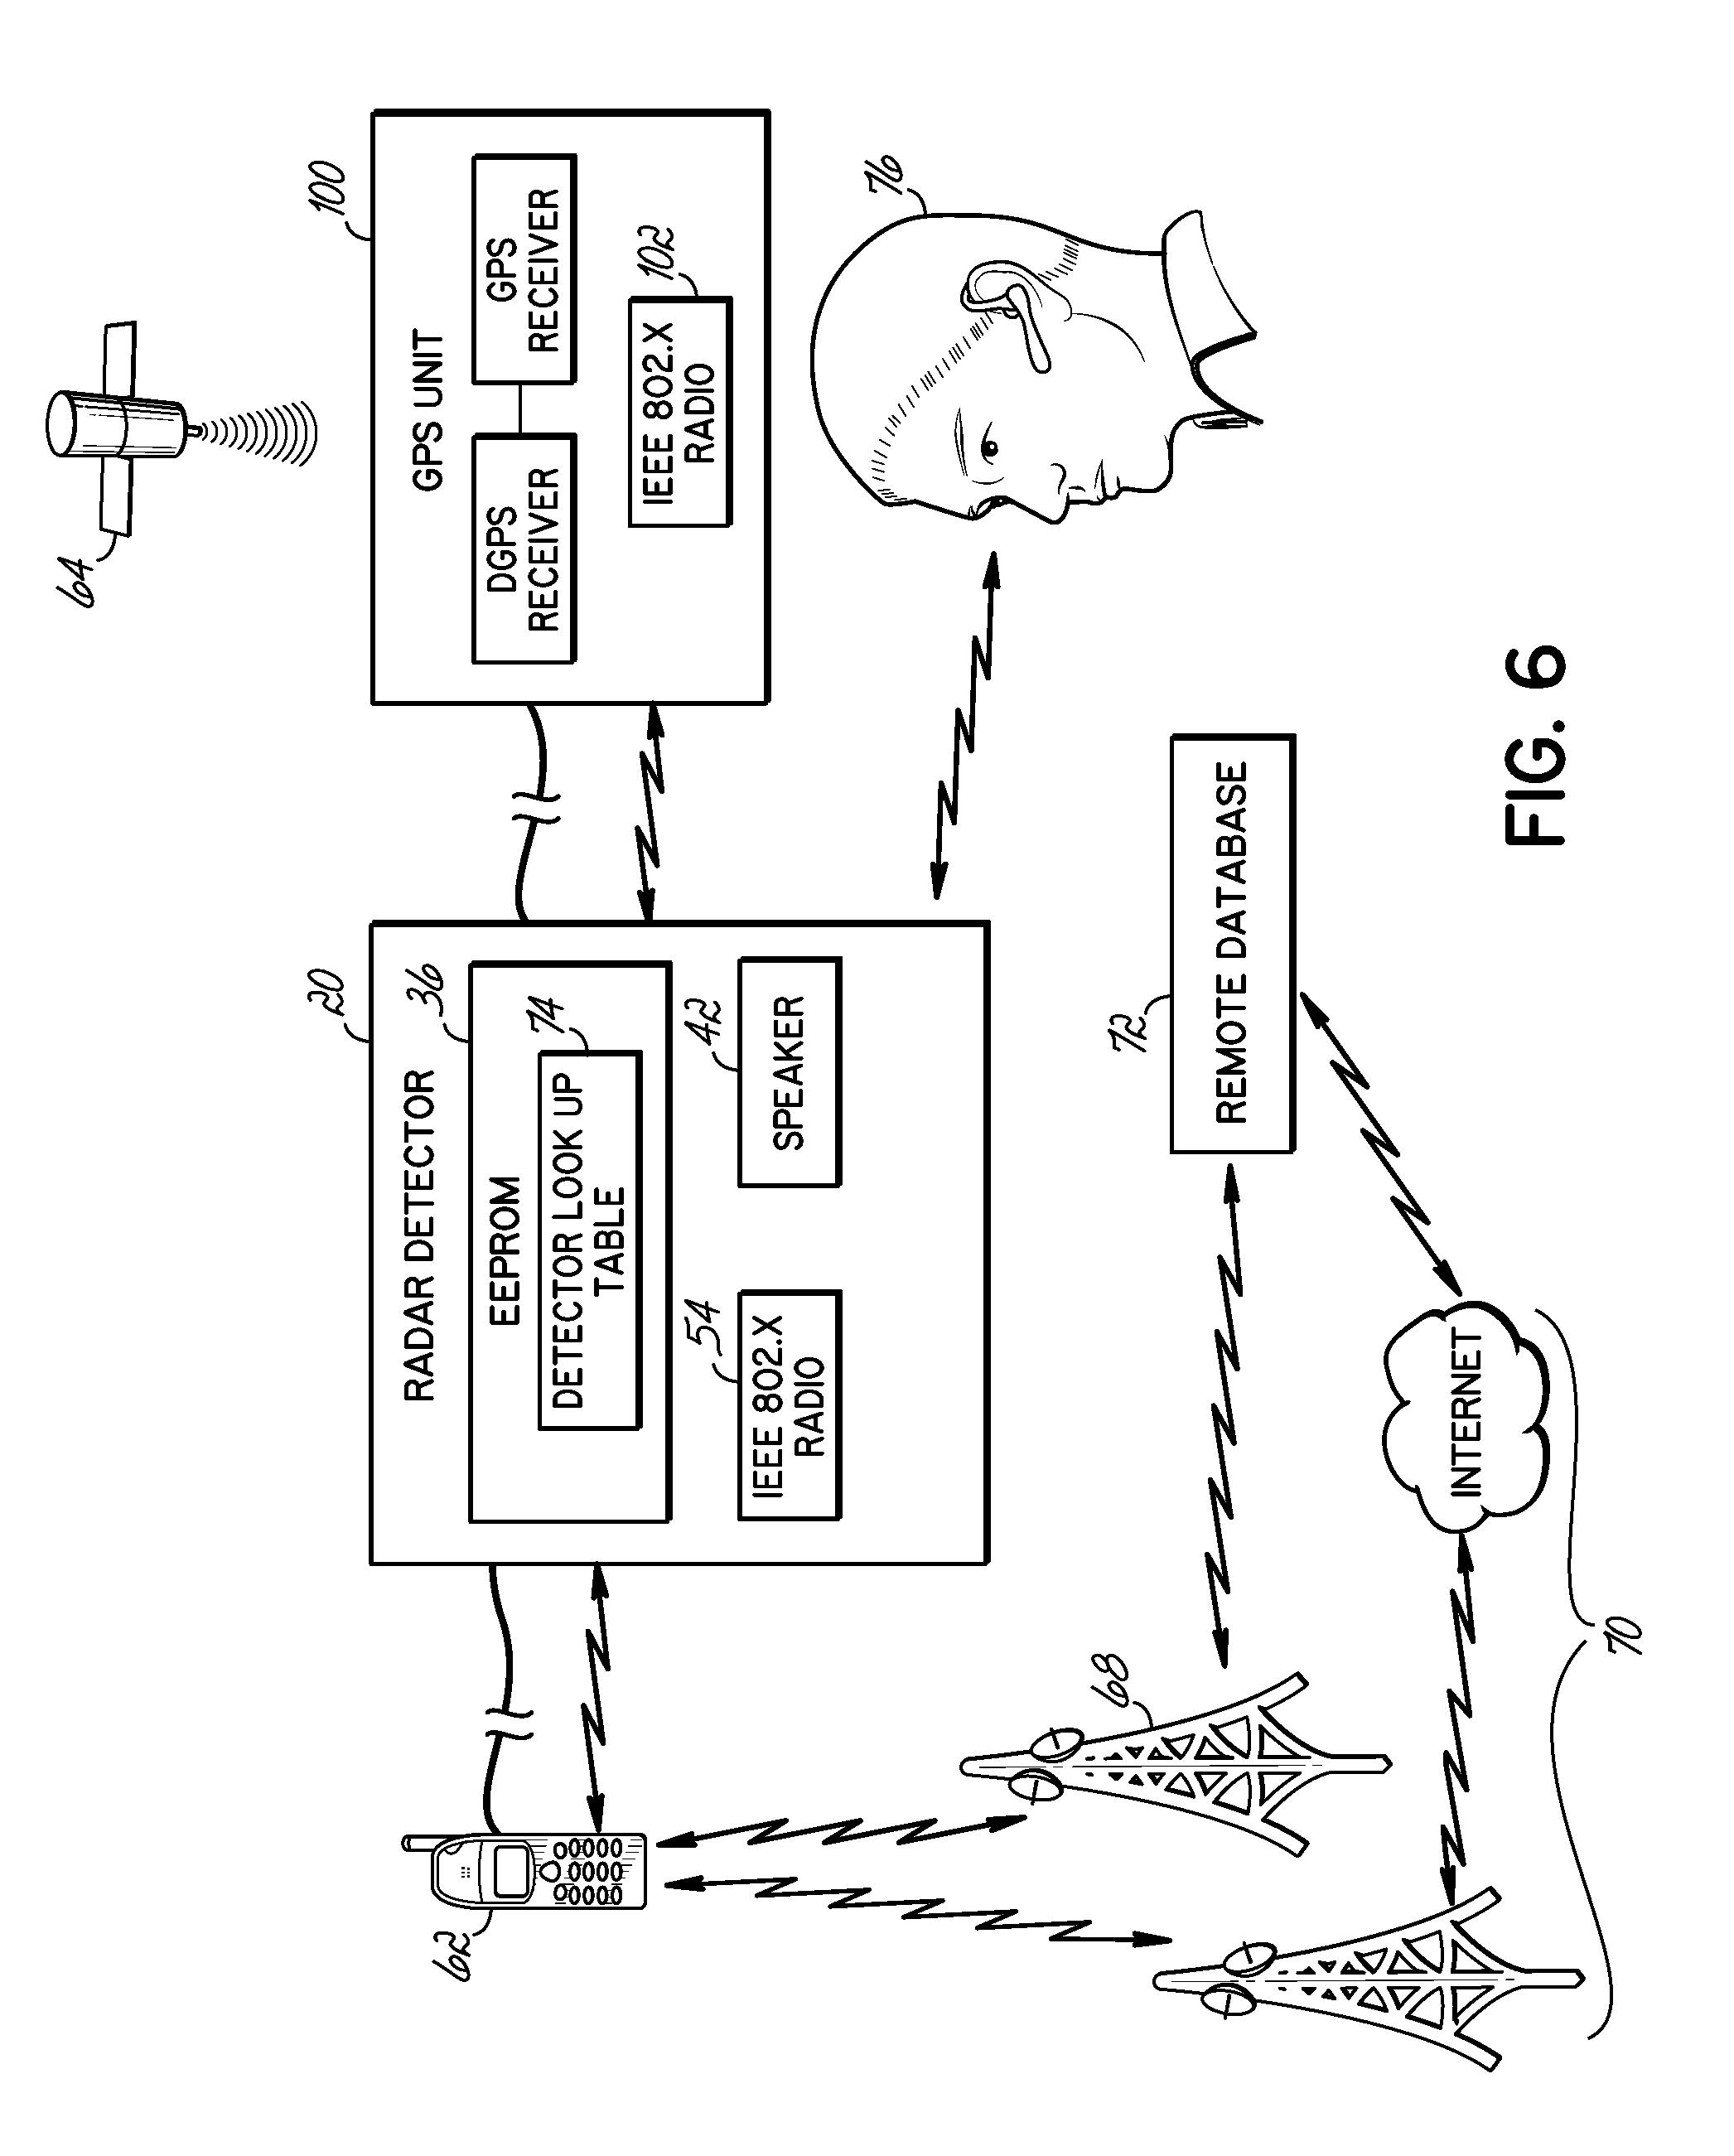 calamp g1000 wiring diagram generac 999 cc engine parts